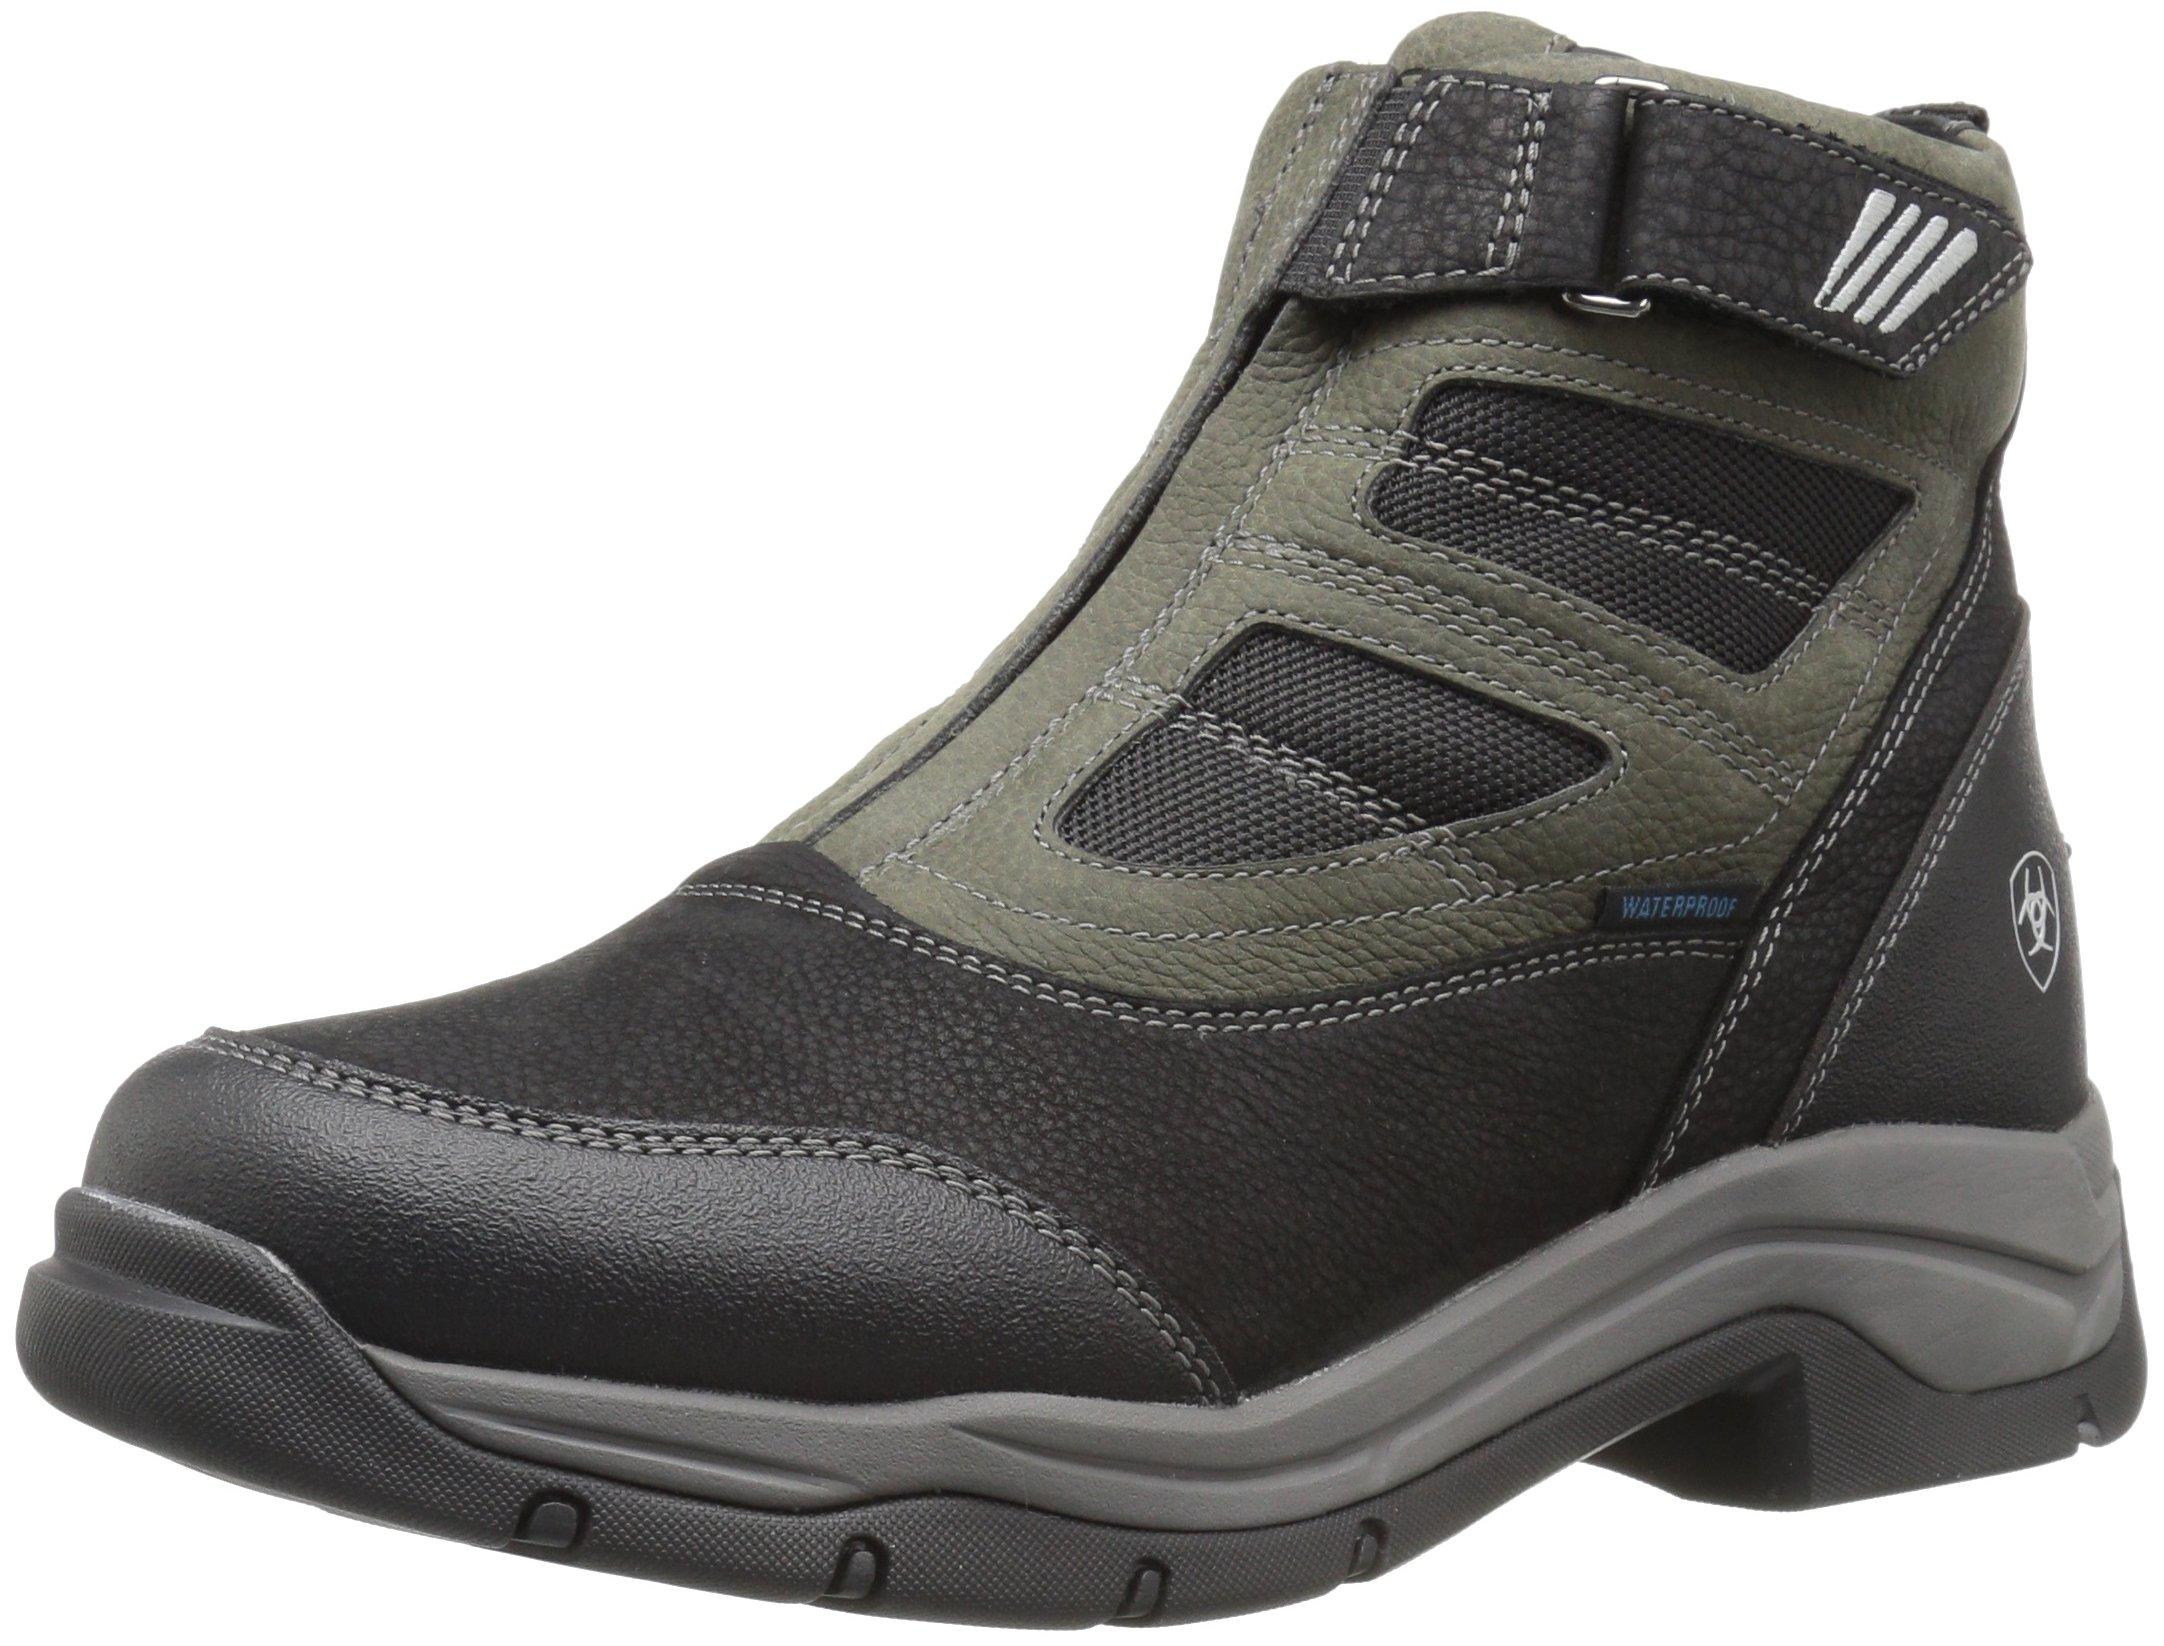 Ariat Women's Terrain Pro Zip H2O Work Boot, Black, 9 B US